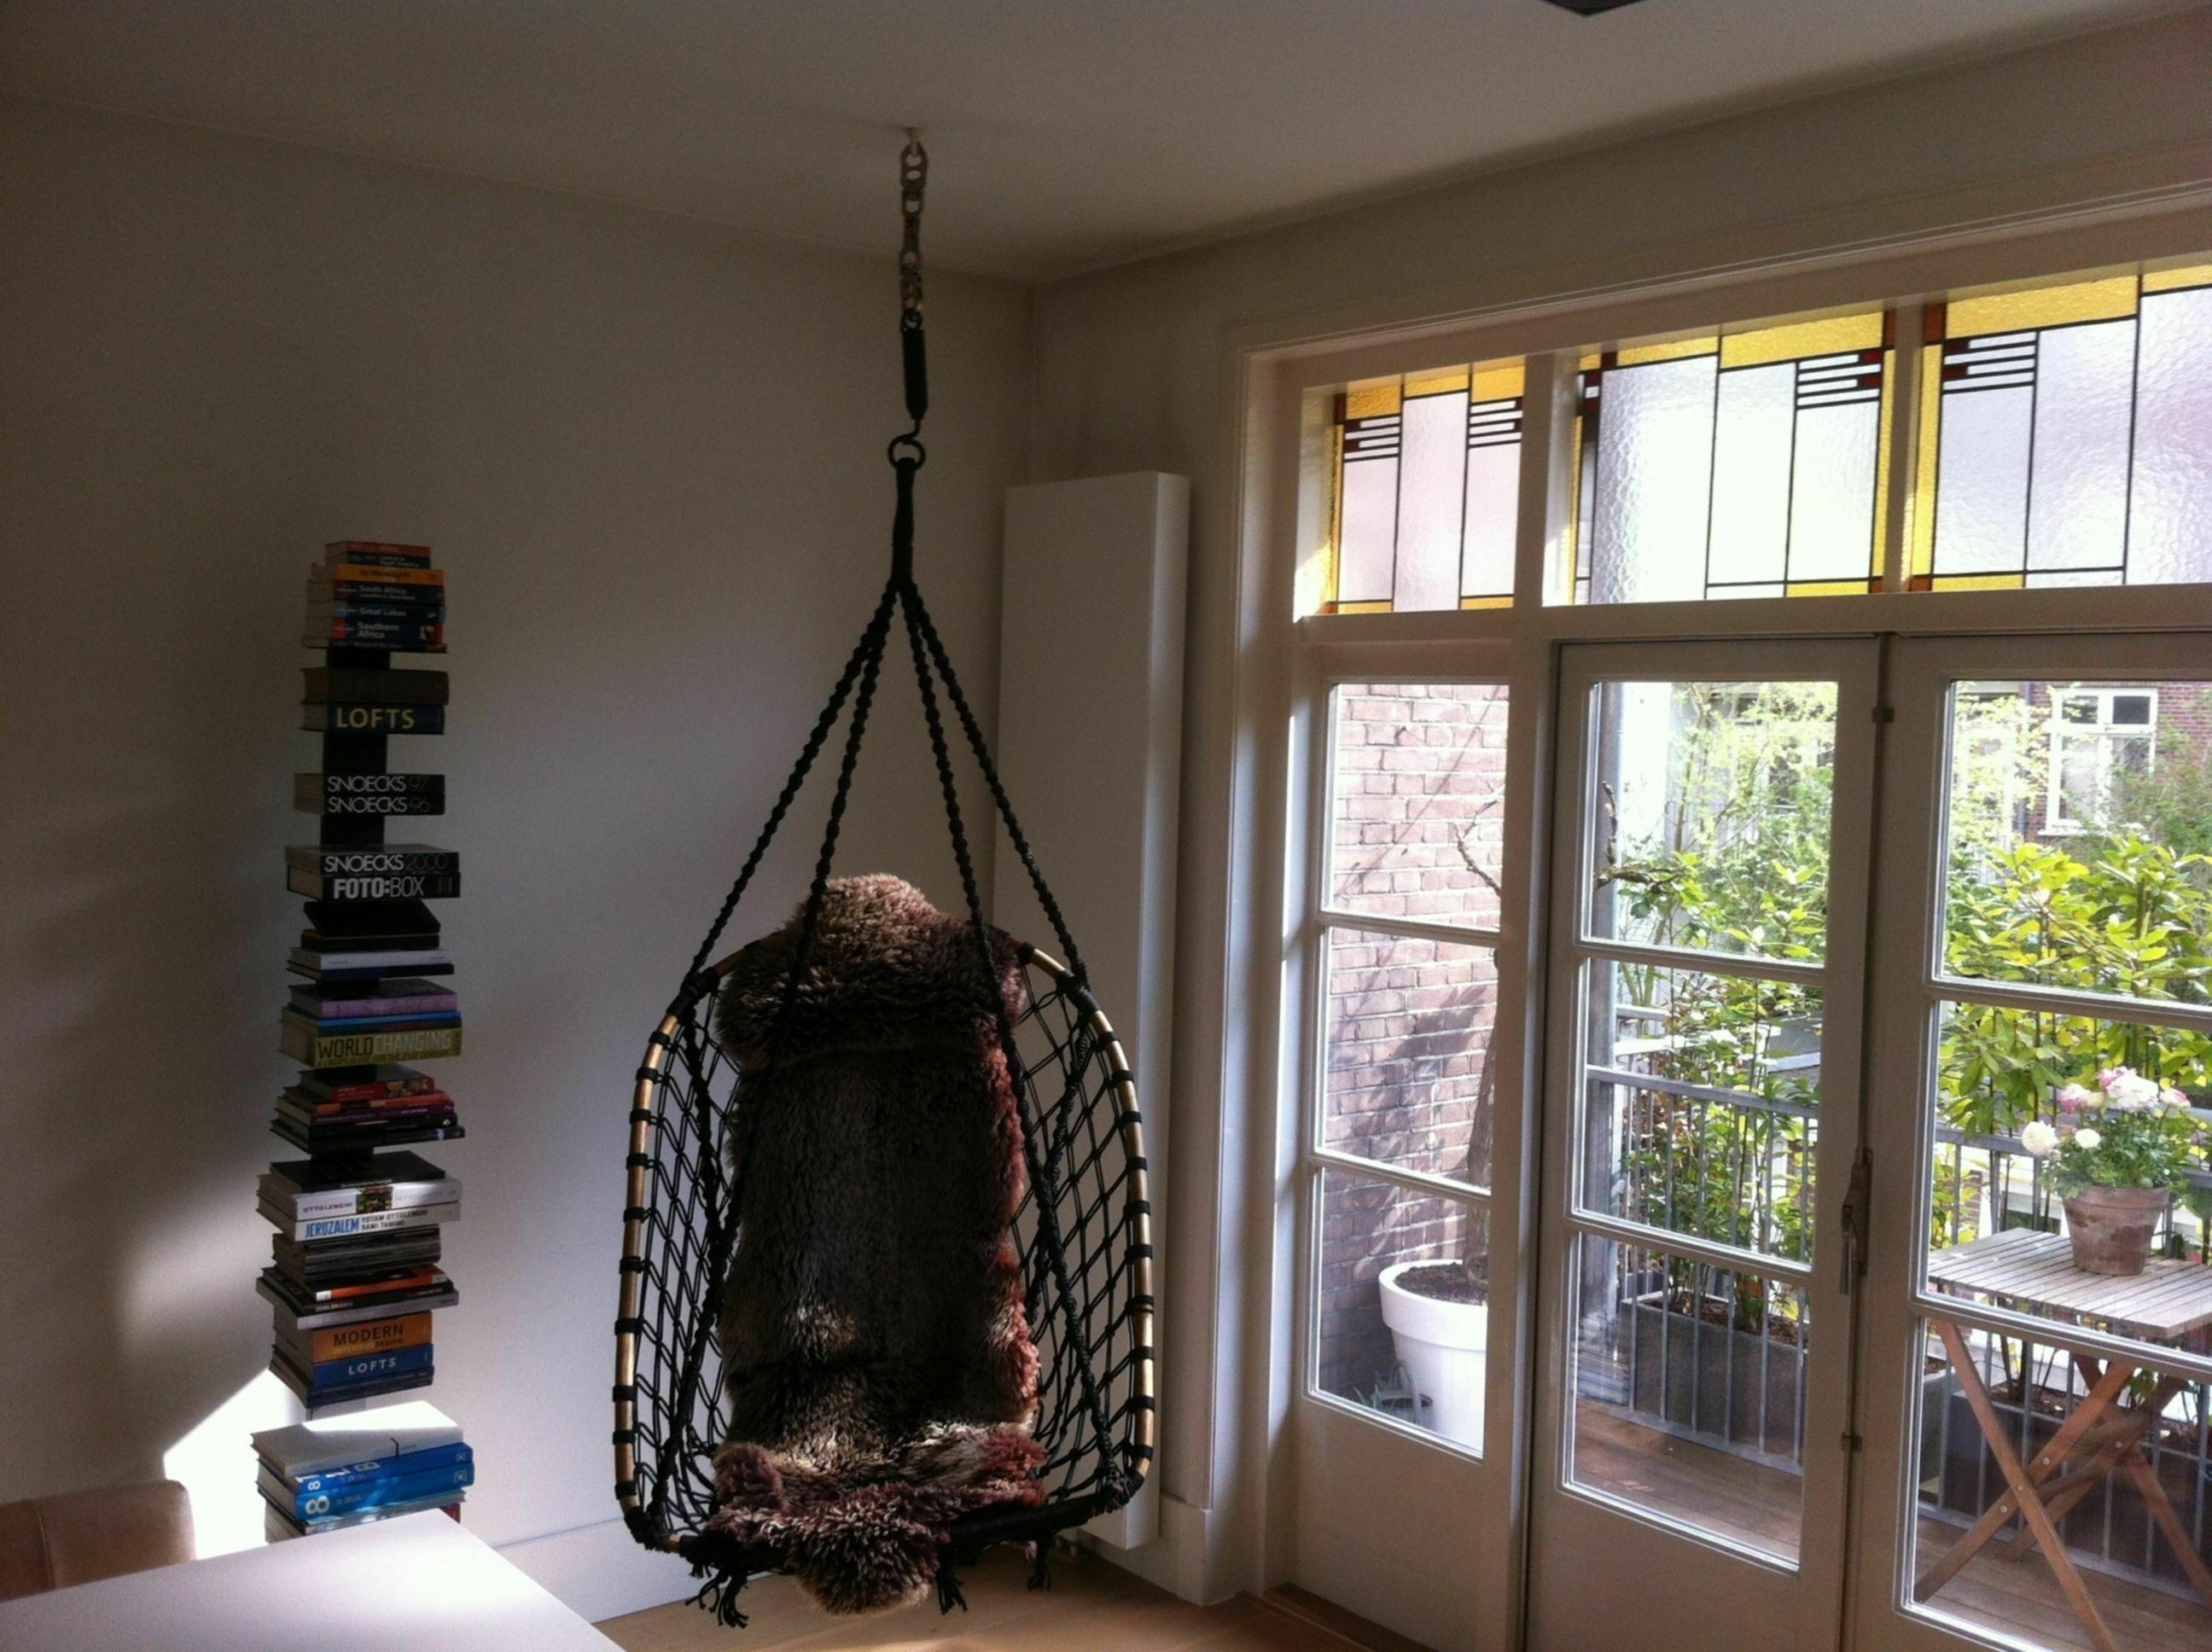 Hangstoel Tuin Praxis.Hangstoel In De Woonkamer Voordemakers Nl